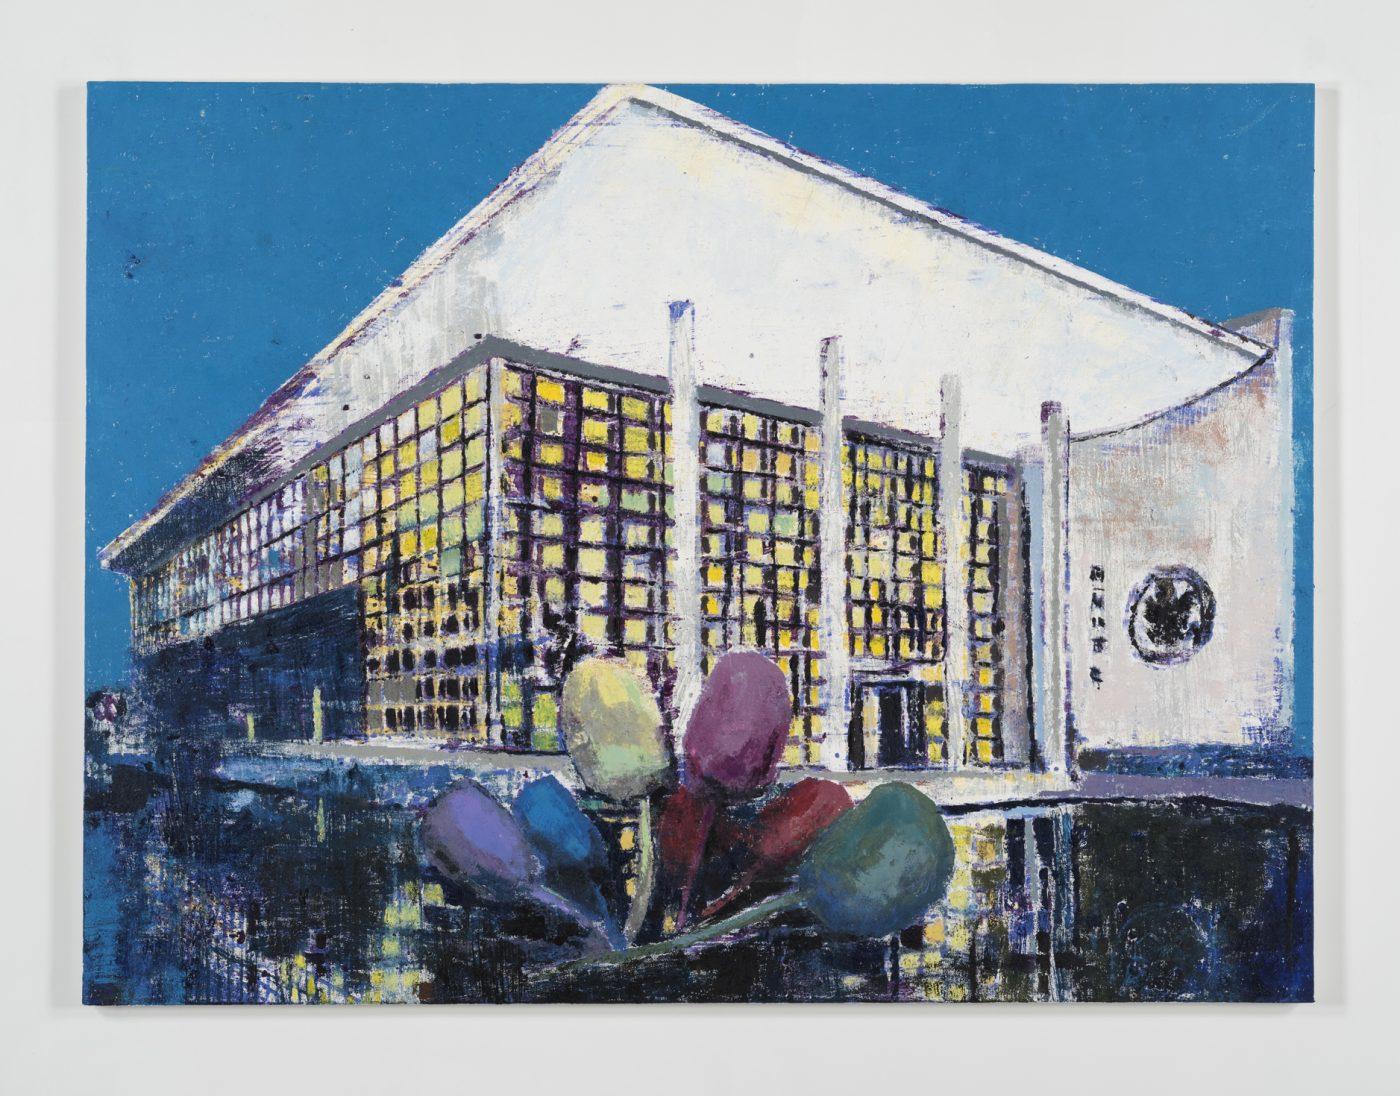 Enoc Perez – Embassies